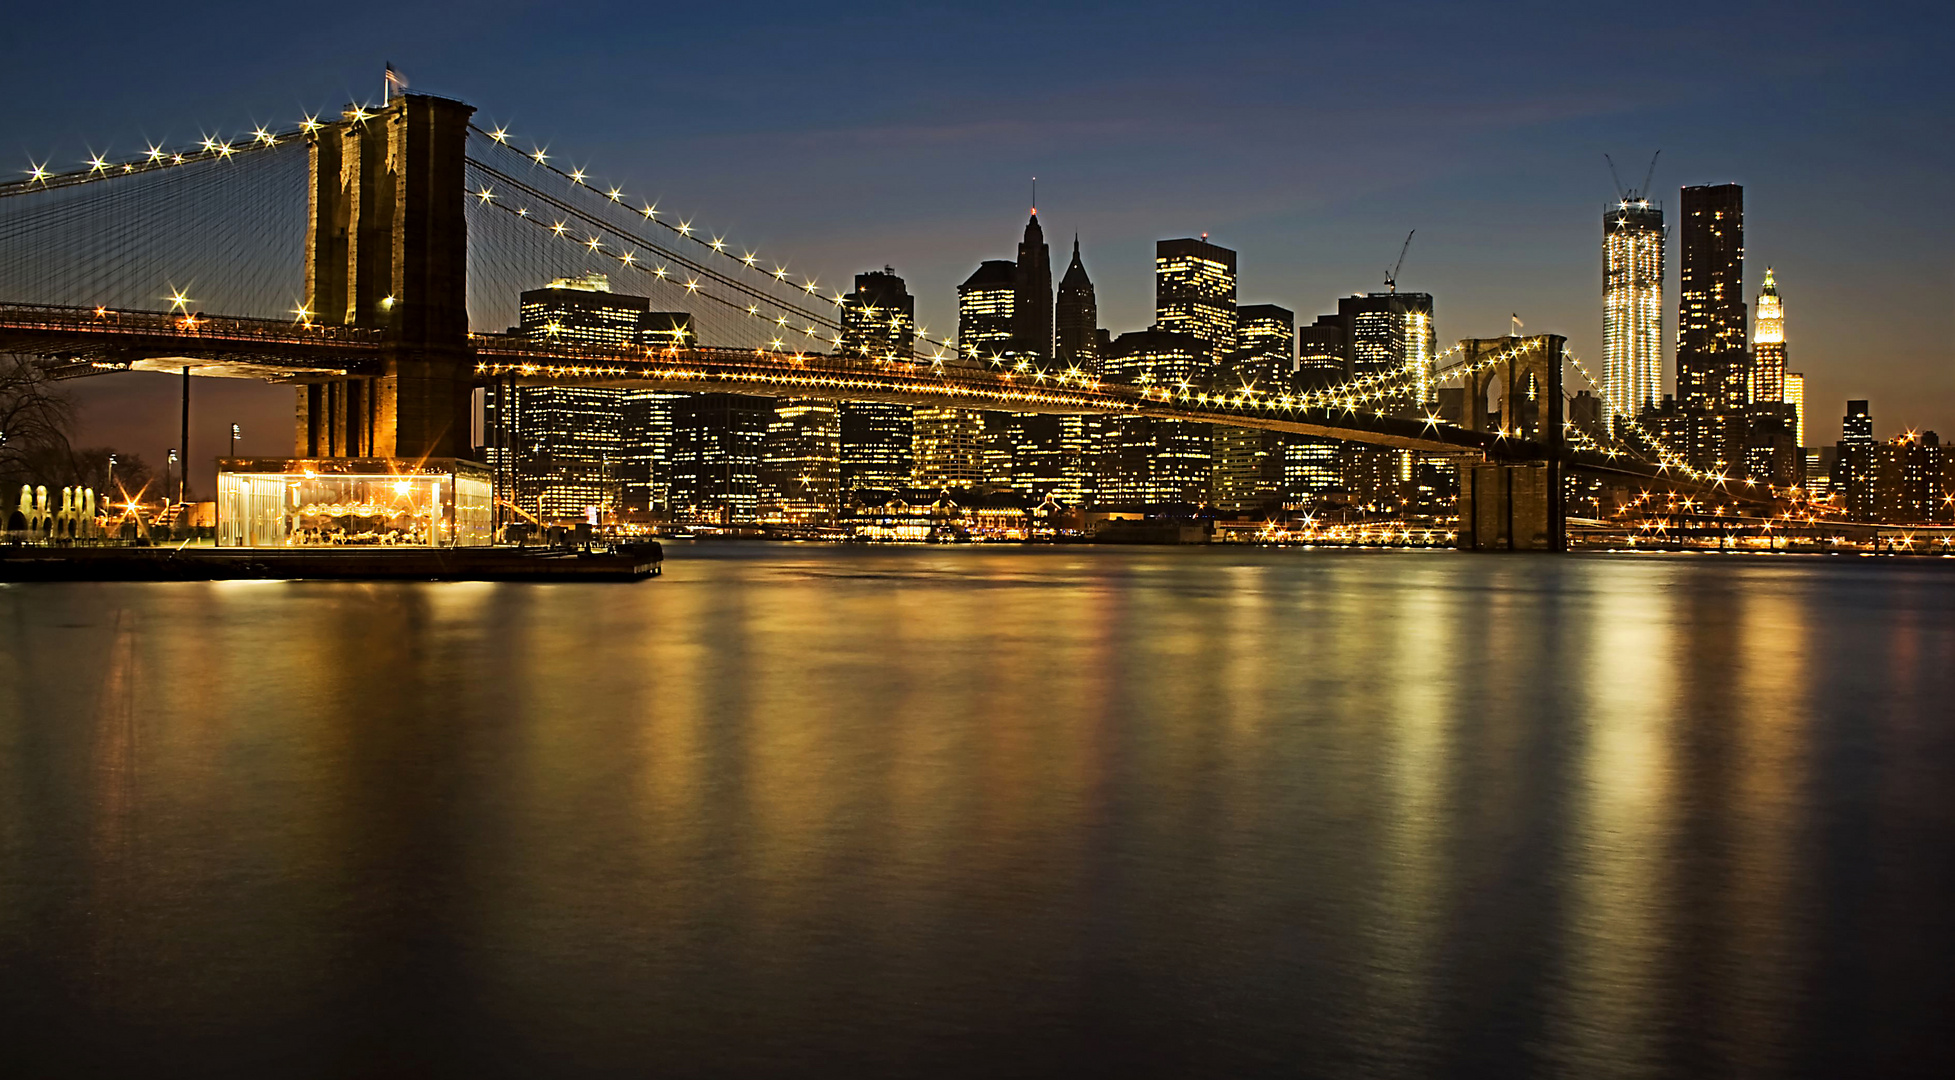 brooklyn bridge with manhattan skyline foto bild north america united states new york. Black Bedroom Furniture Sets. Home Design Ideas